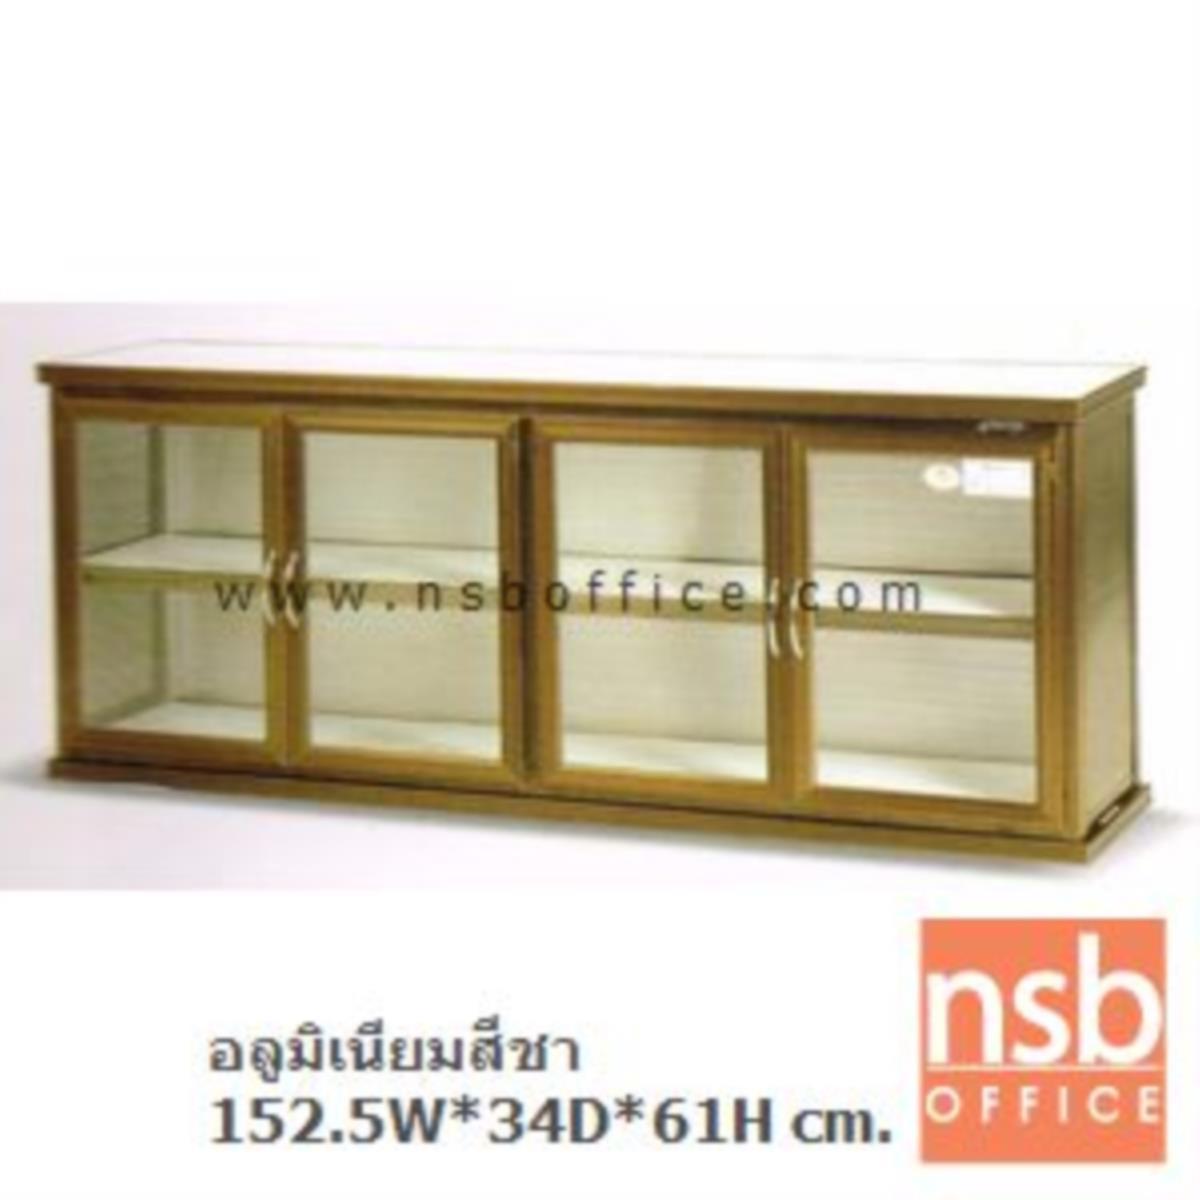 G07A061:ตู้แขวนอลูมิเนียม SANKI หน้าบานกระจกใส รุ่น HCZ 61H*152.5W cm.